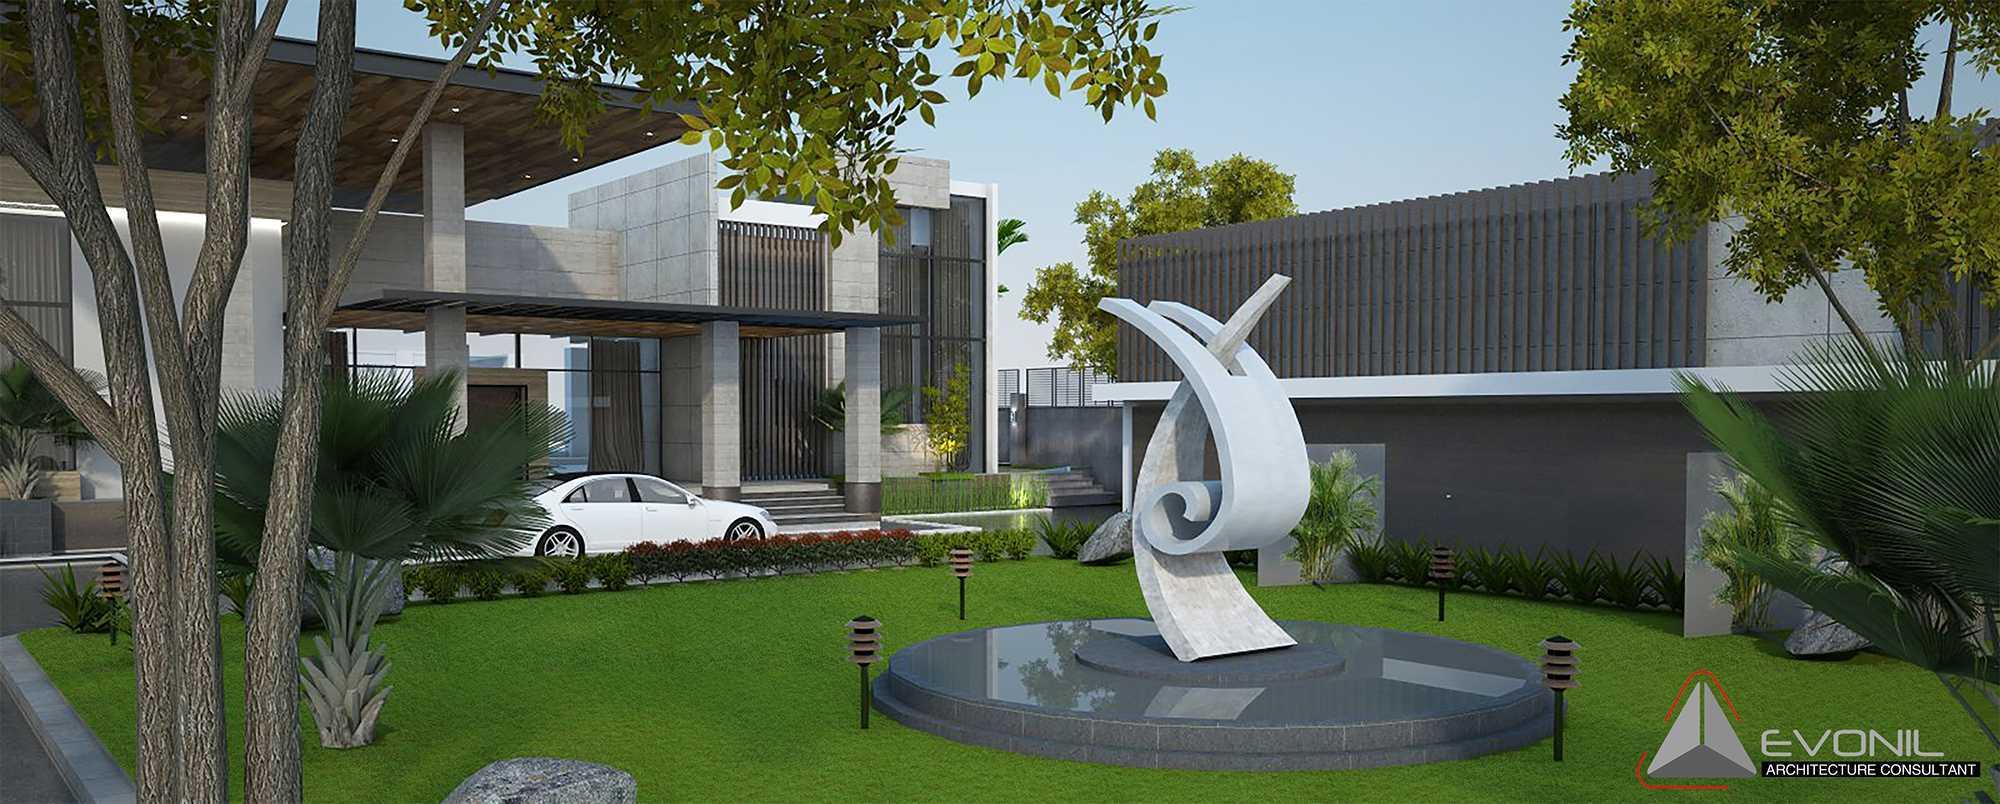 Evonil Architecture Residence Pangkalan Bun Pangkalan Bun, Kalimantan, Indonesia Pangkalan Bun, Kalimantan, Indonesia Eksterior-3-Residence-Pangkalan-Bun Modern  13126